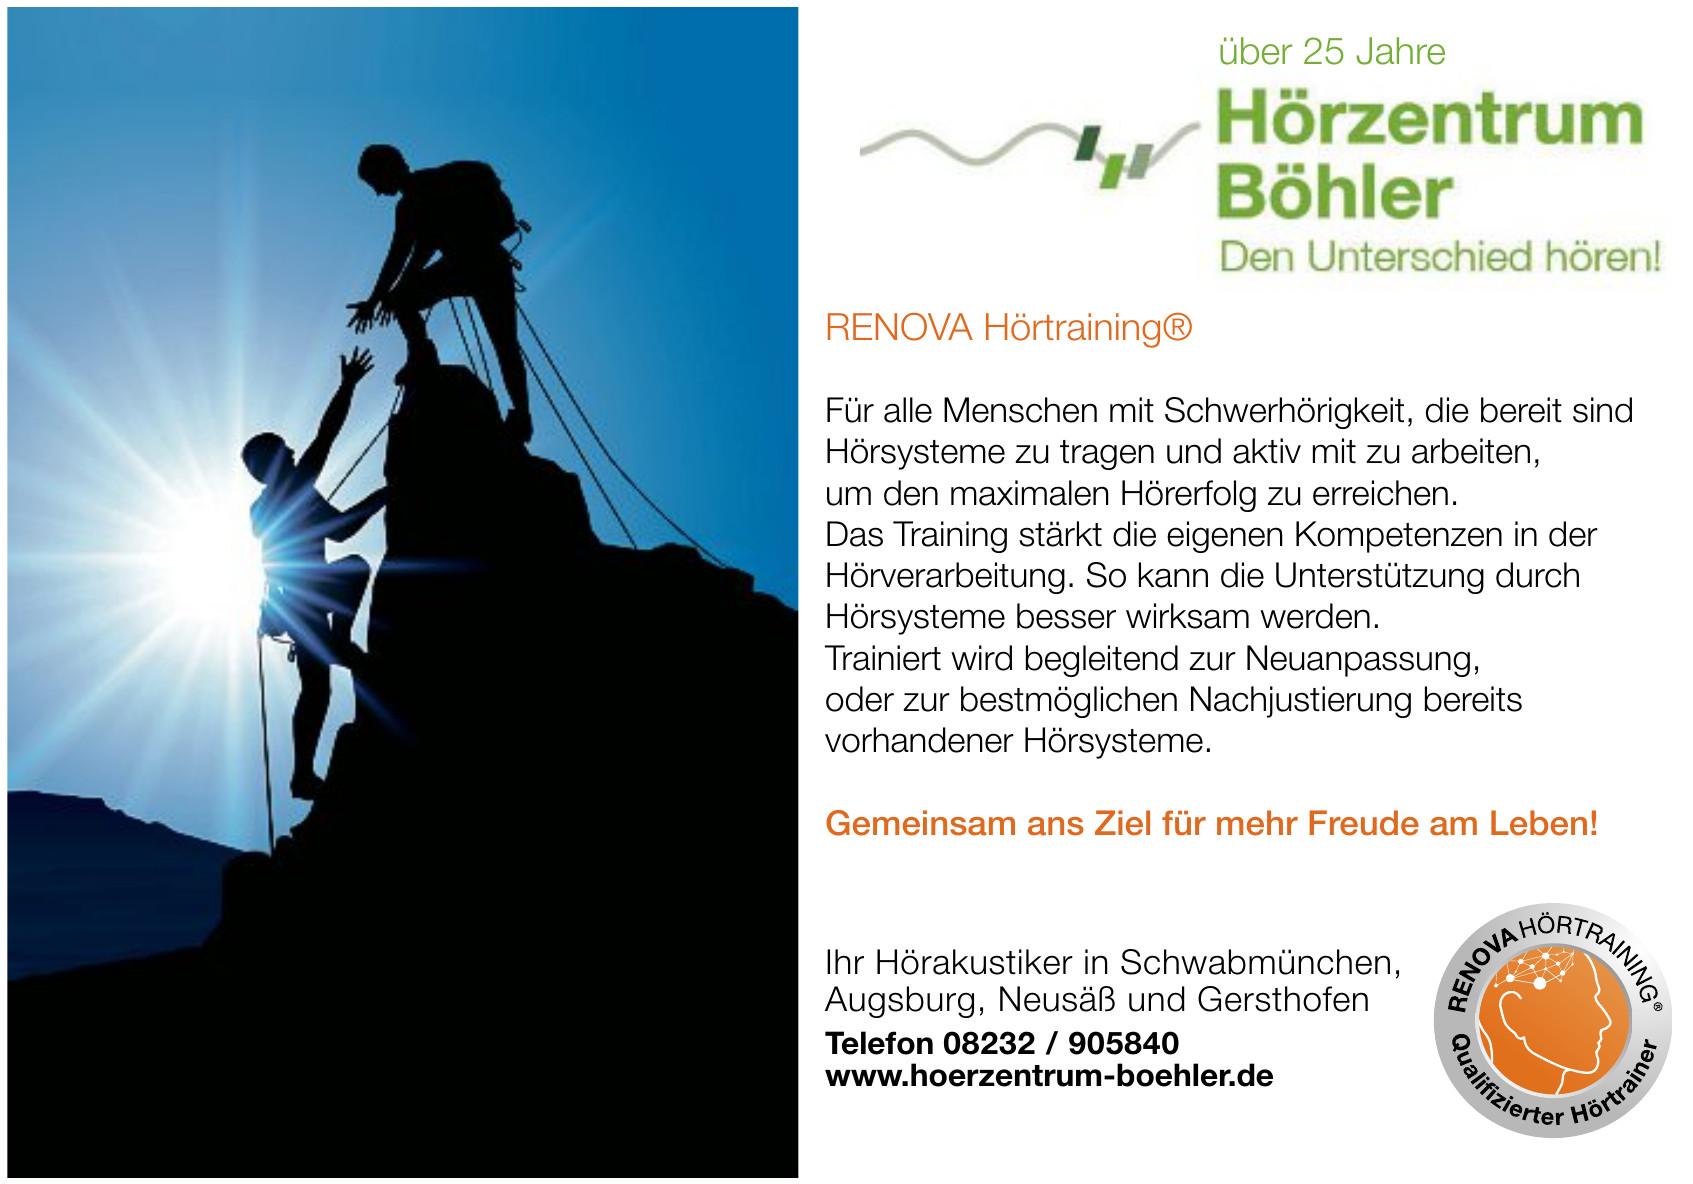 Hörzentrum Böhler GmbH